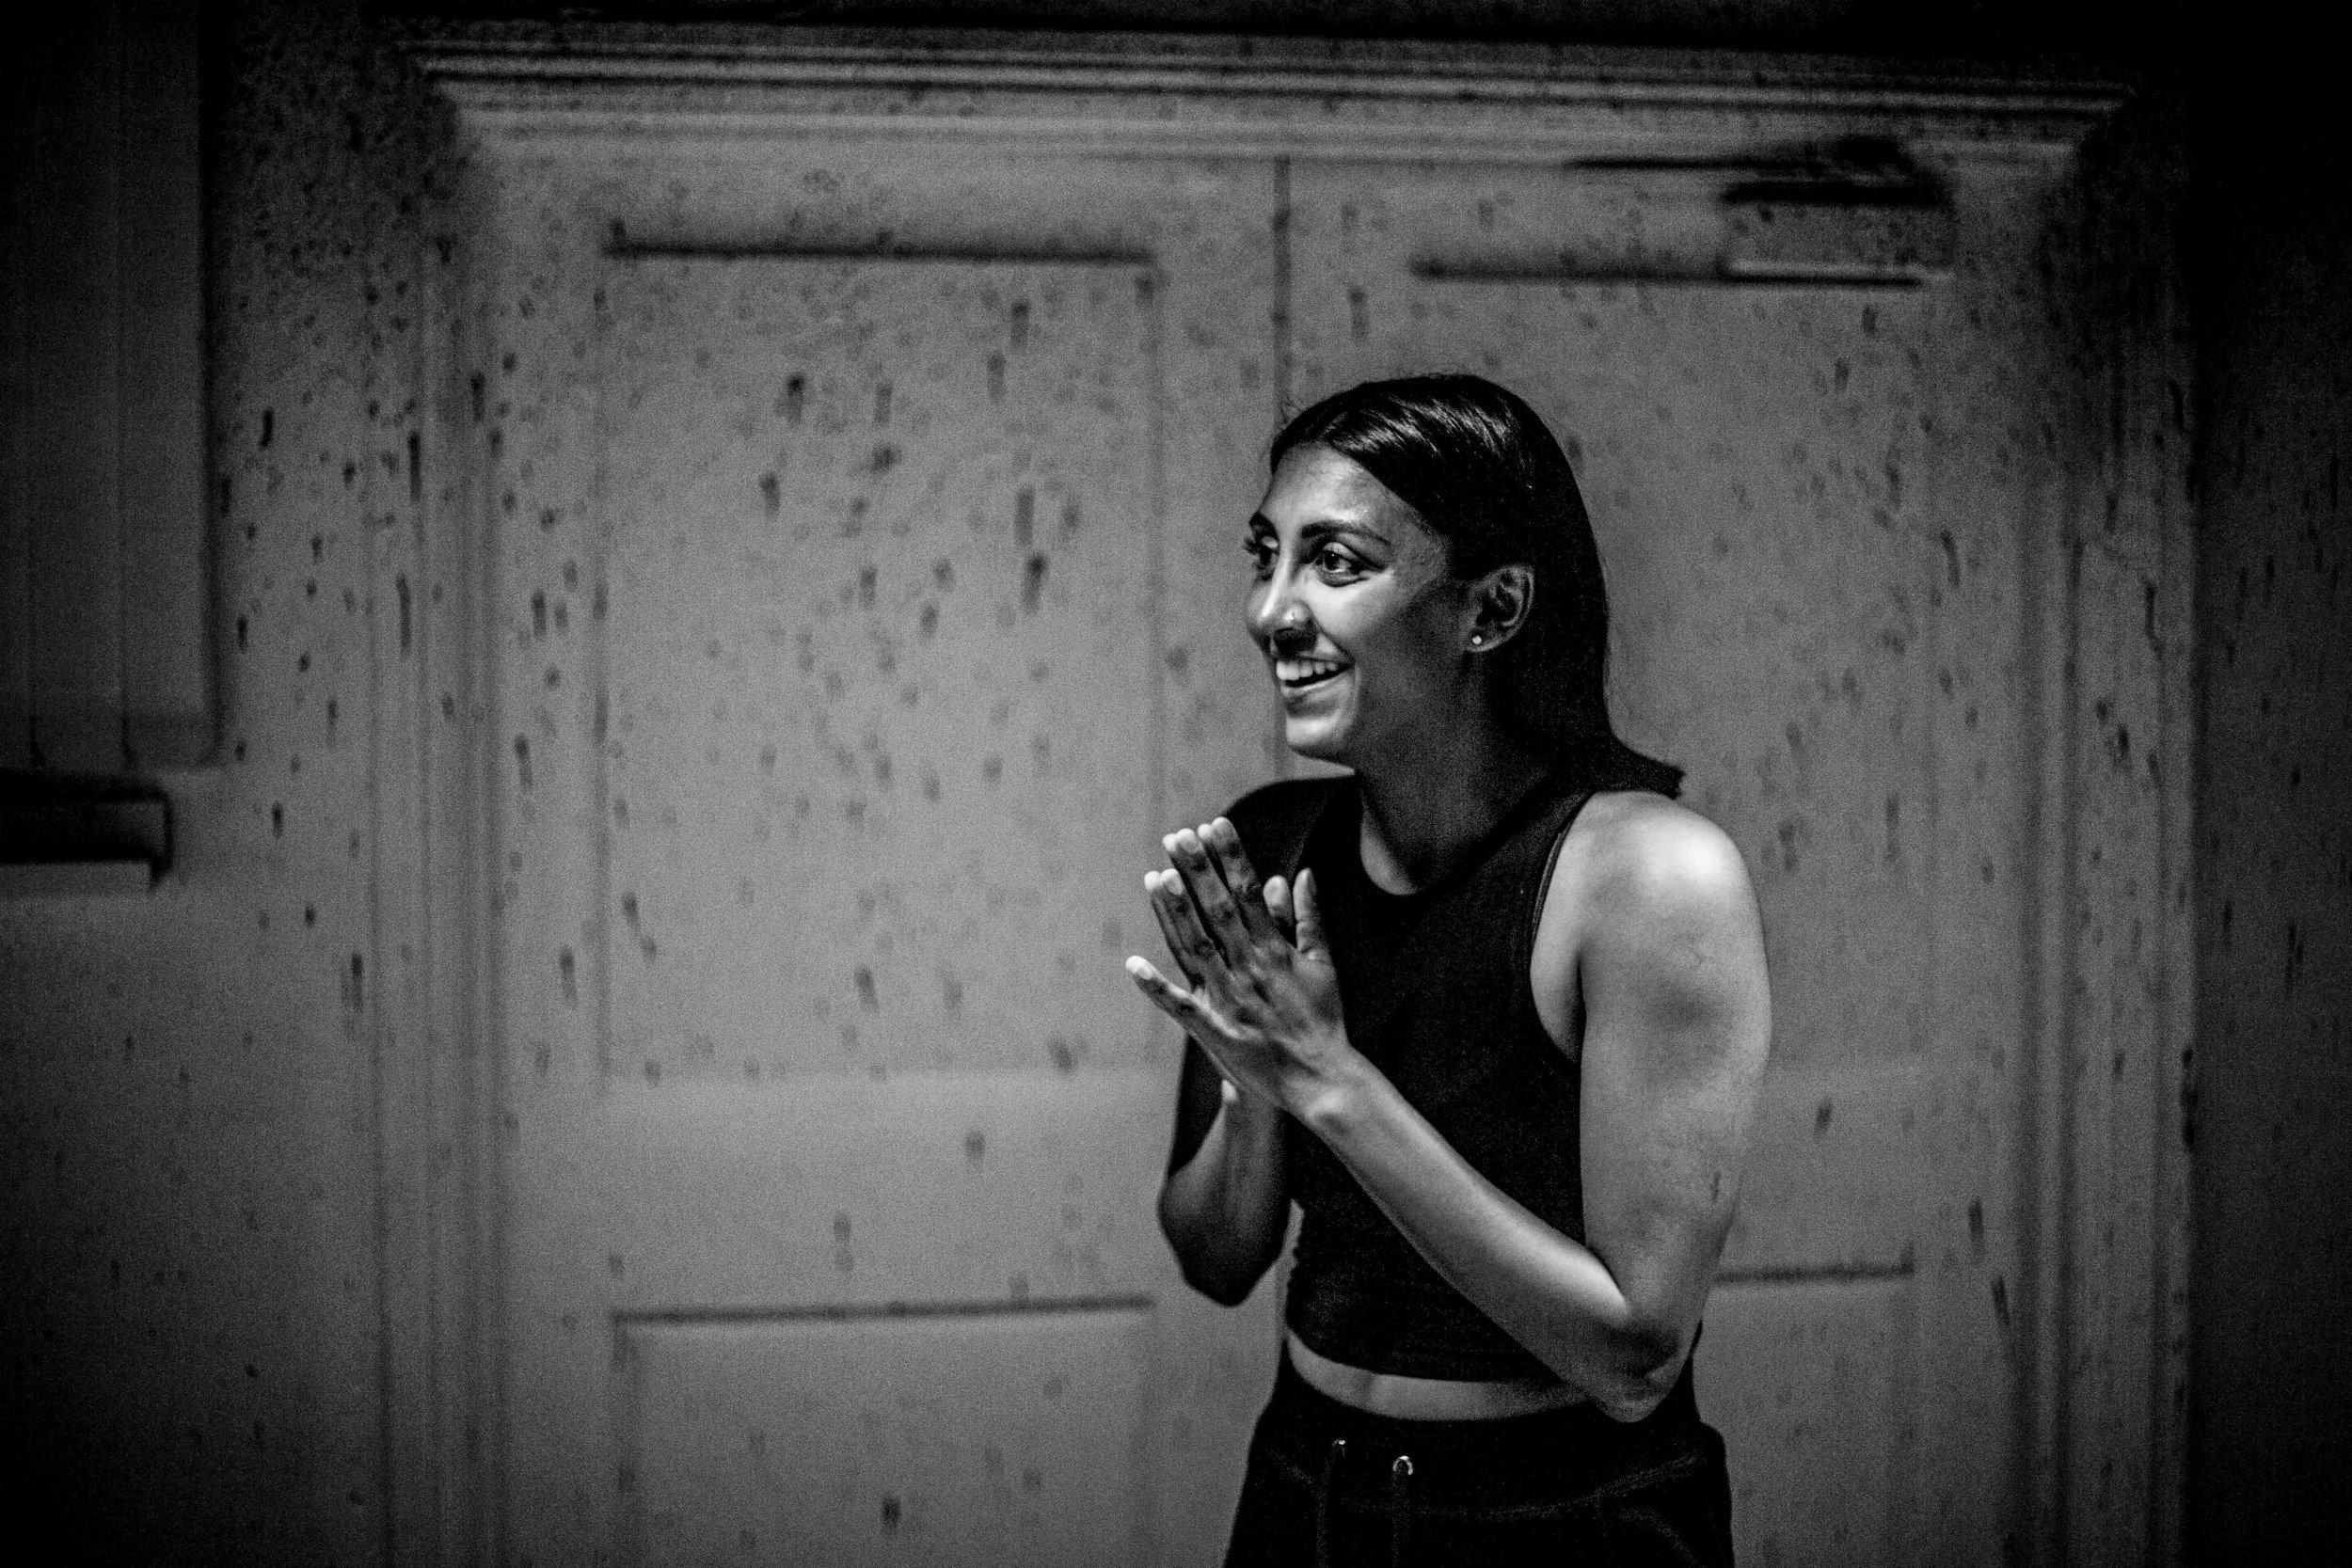 Natasha Patel in rehearsal for Cuttings. Photo courtesy of Cam Harle (2019).